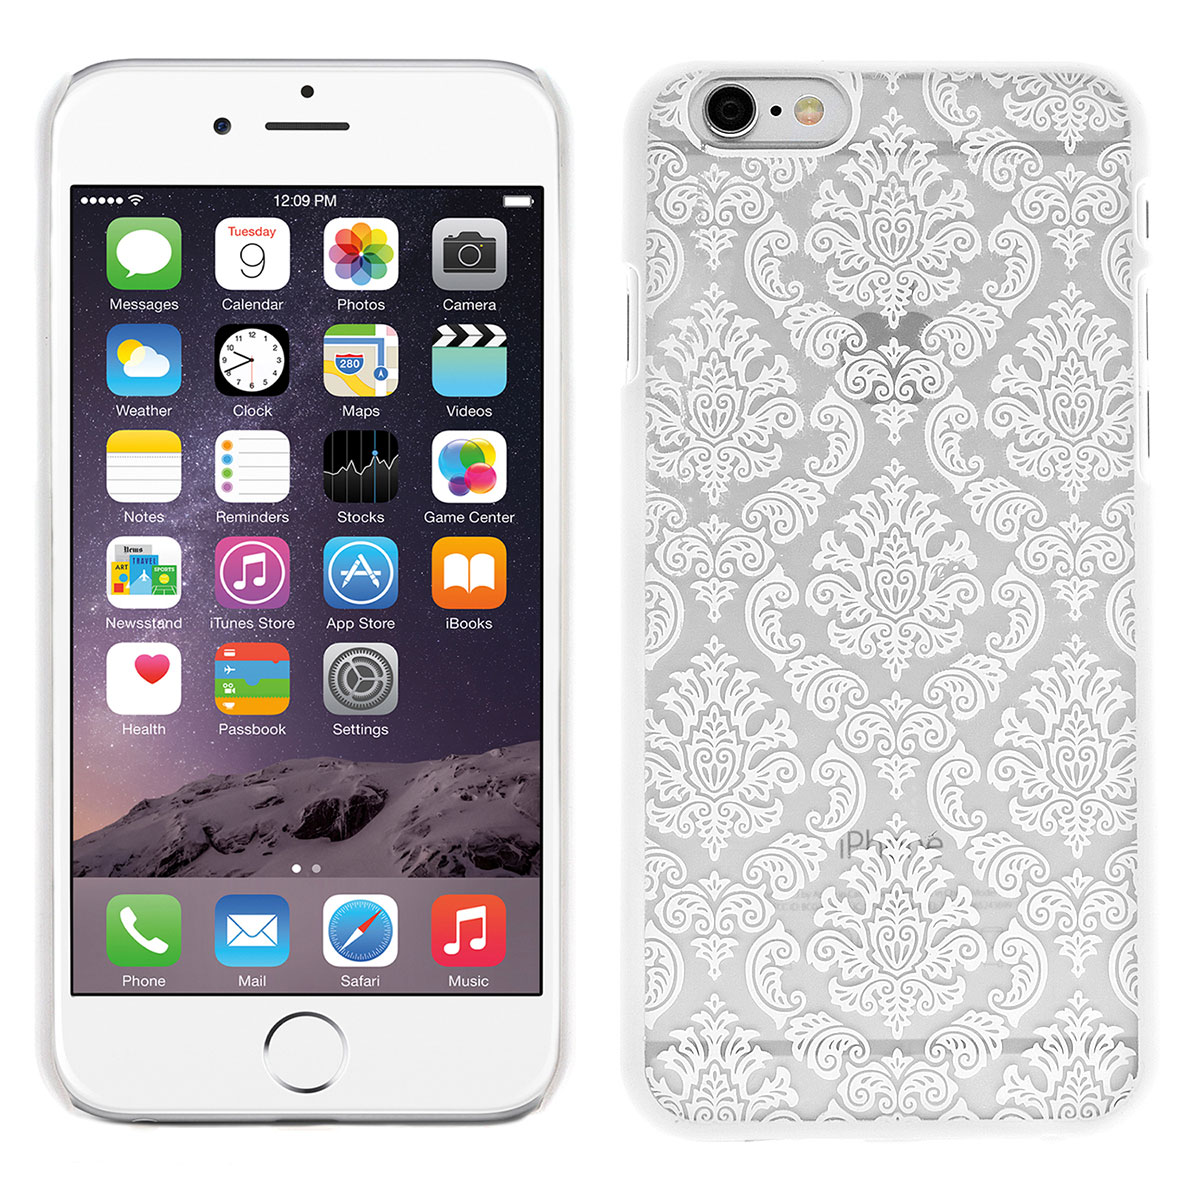 iPhone 6 Schutzhülle Embossed Blumen Paisley Muster(weiss)